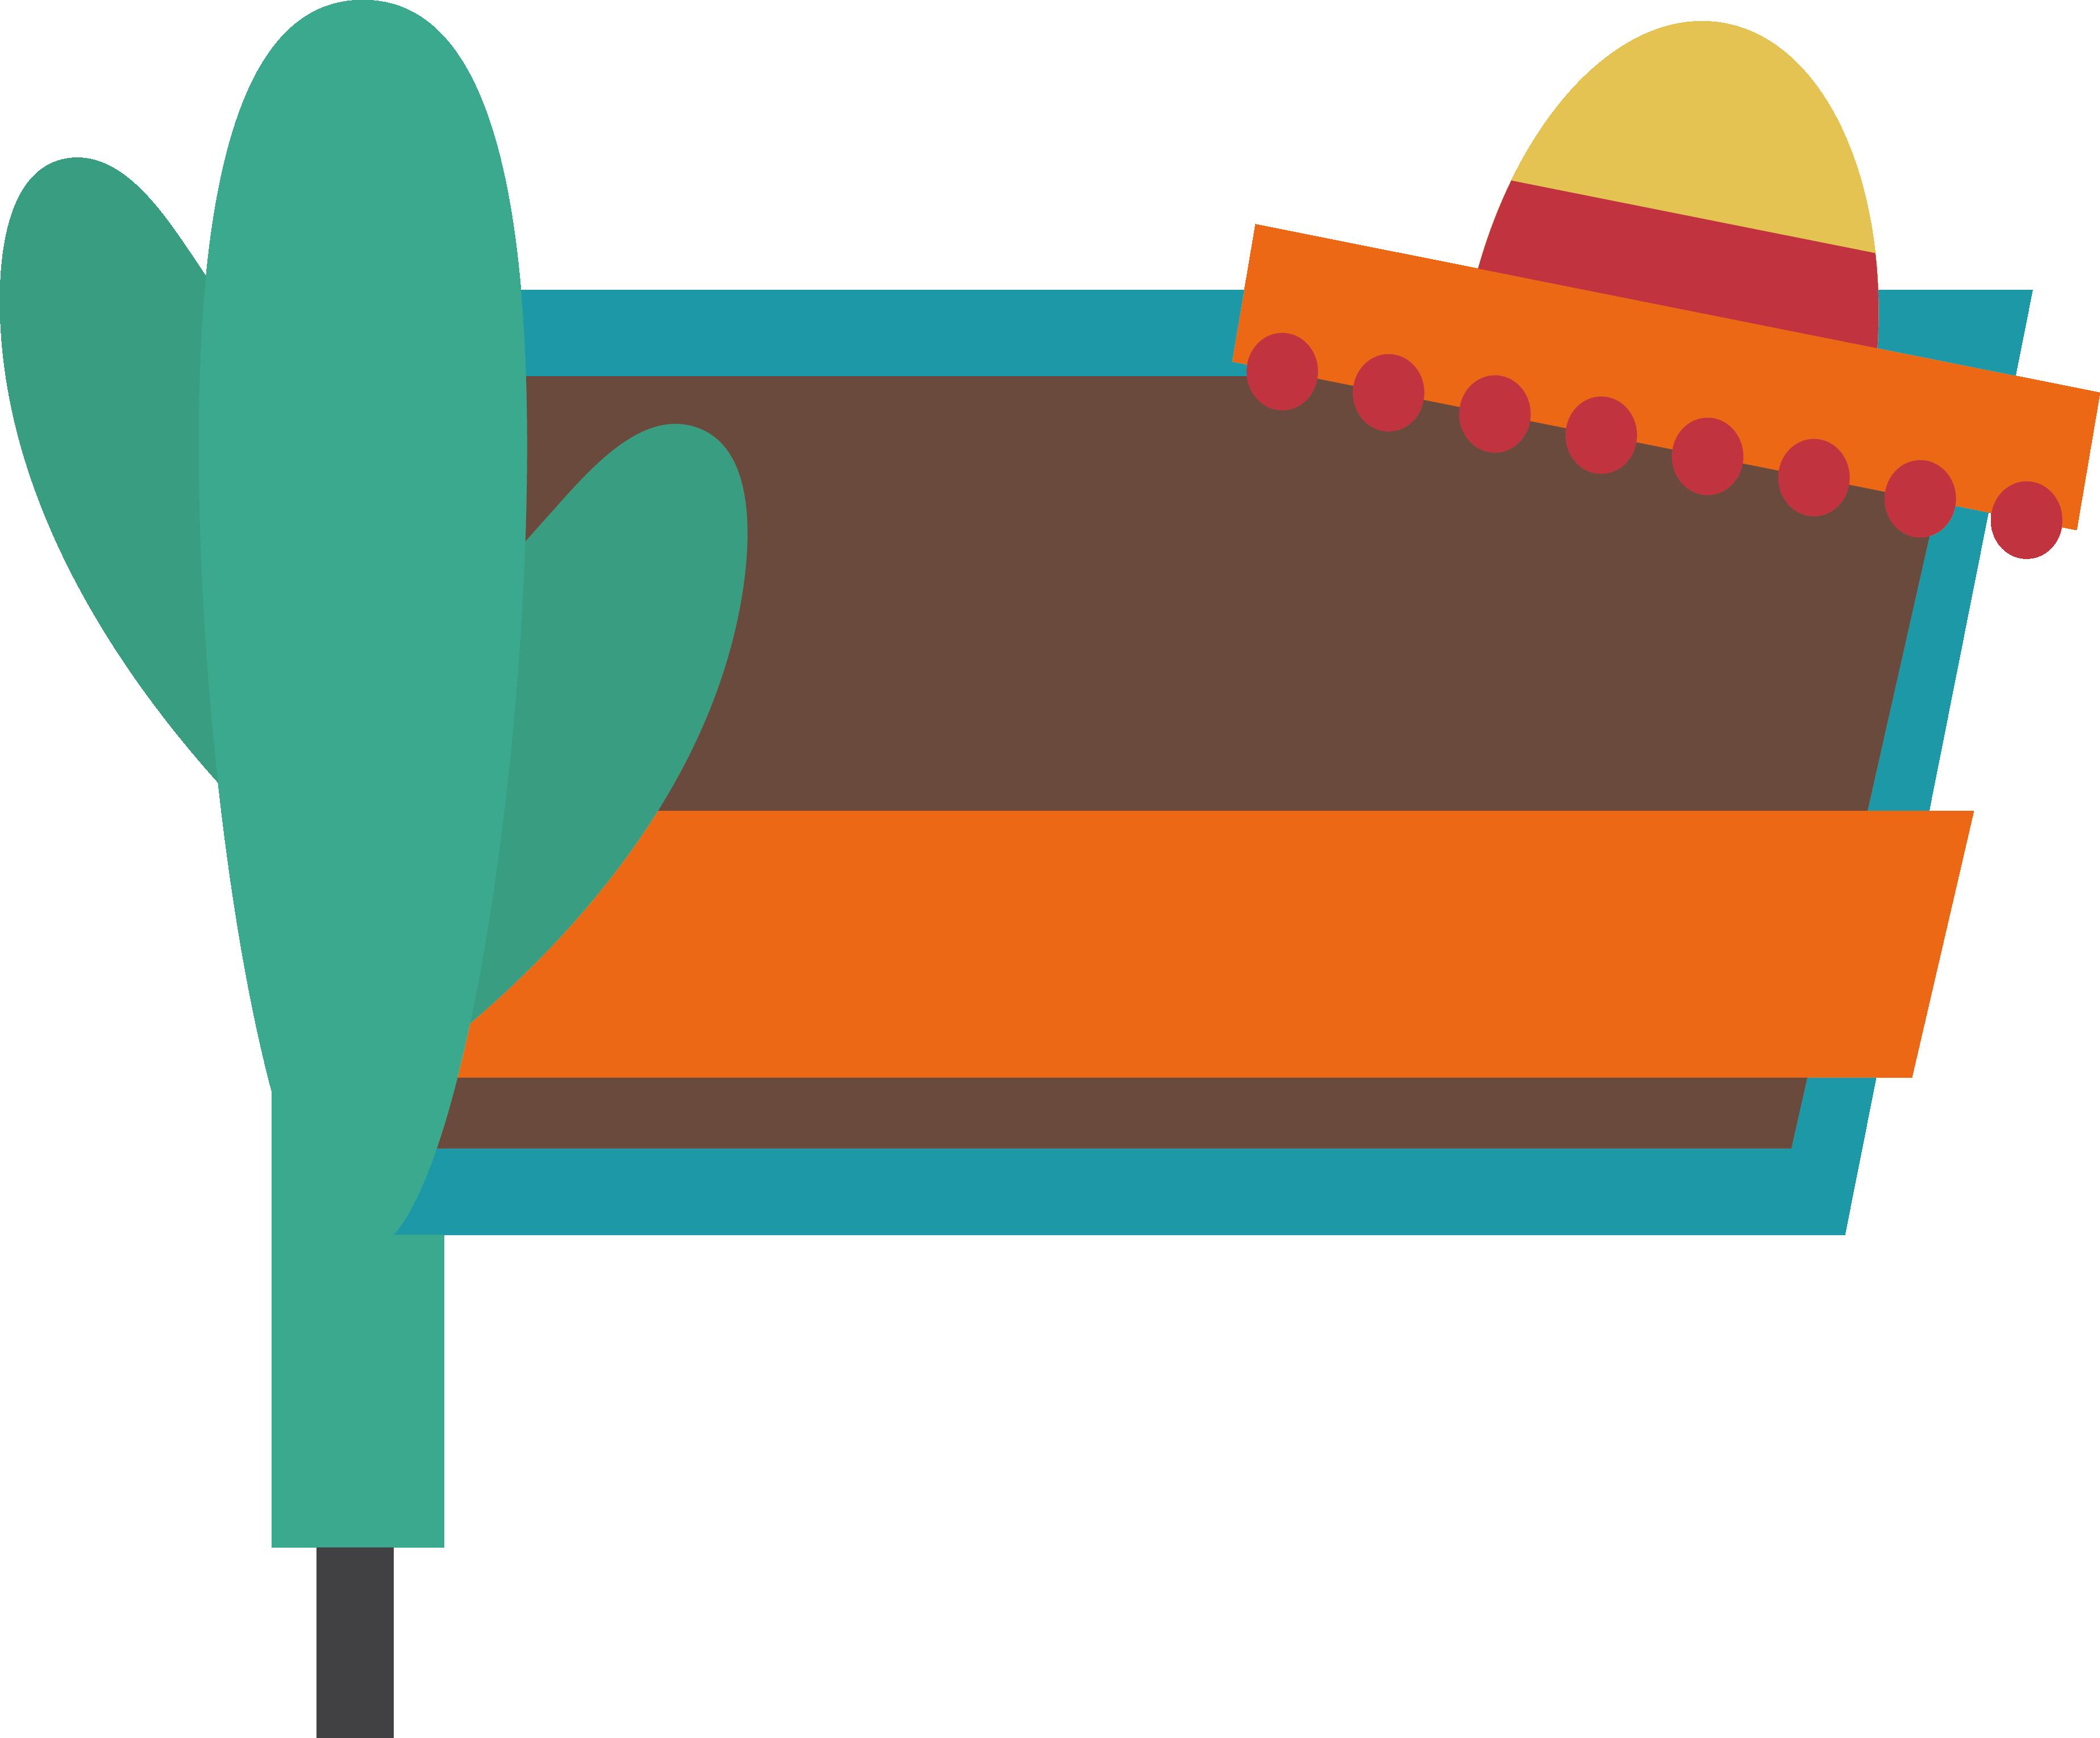 Furniture clipart adobe illustrator. Clip art cactus straw